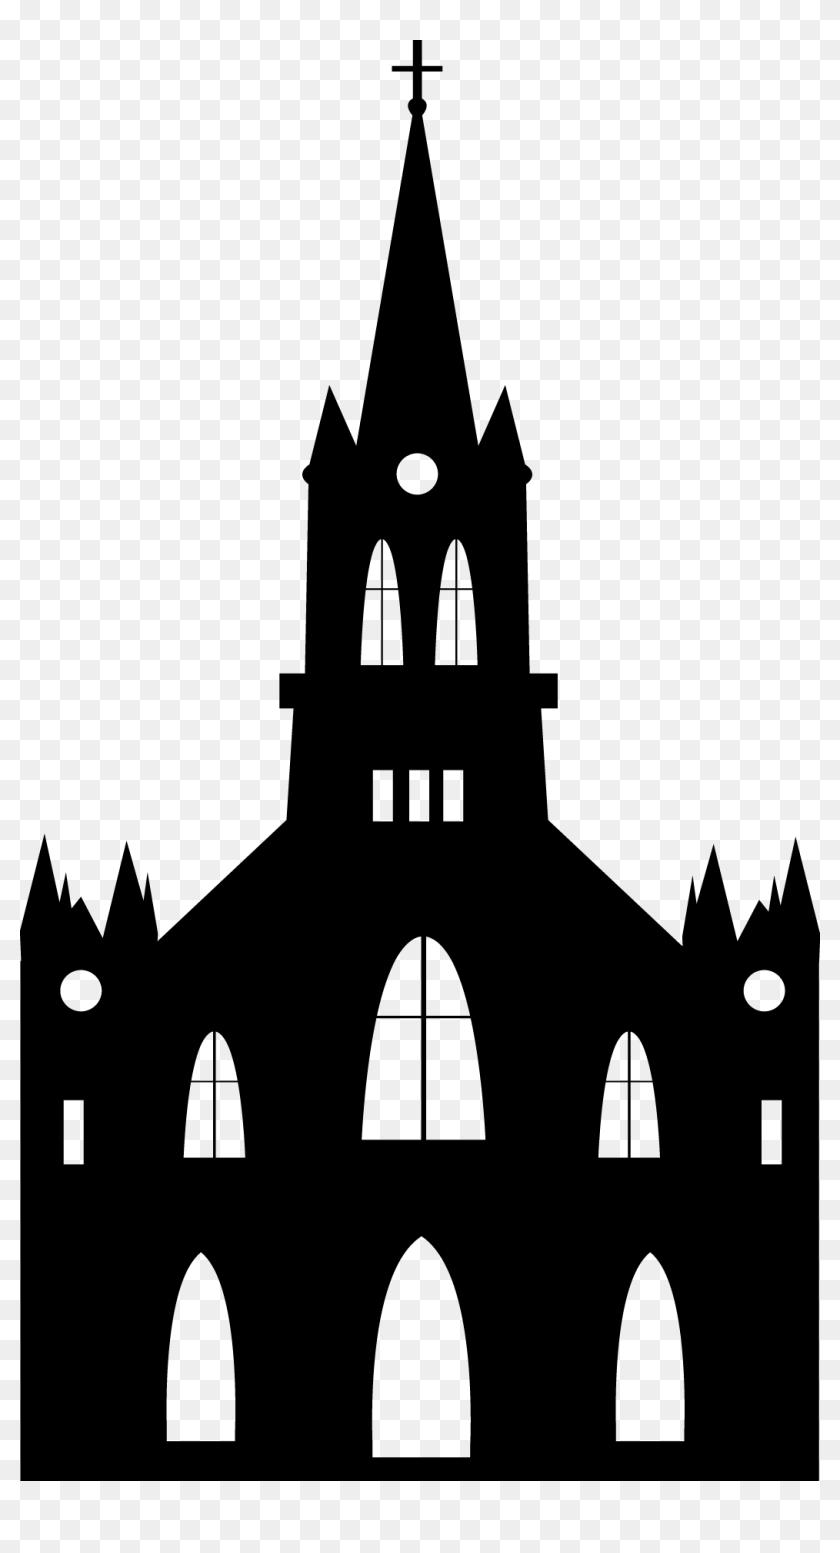 Euclidean Vector Church Religion Silhouette Silhouette